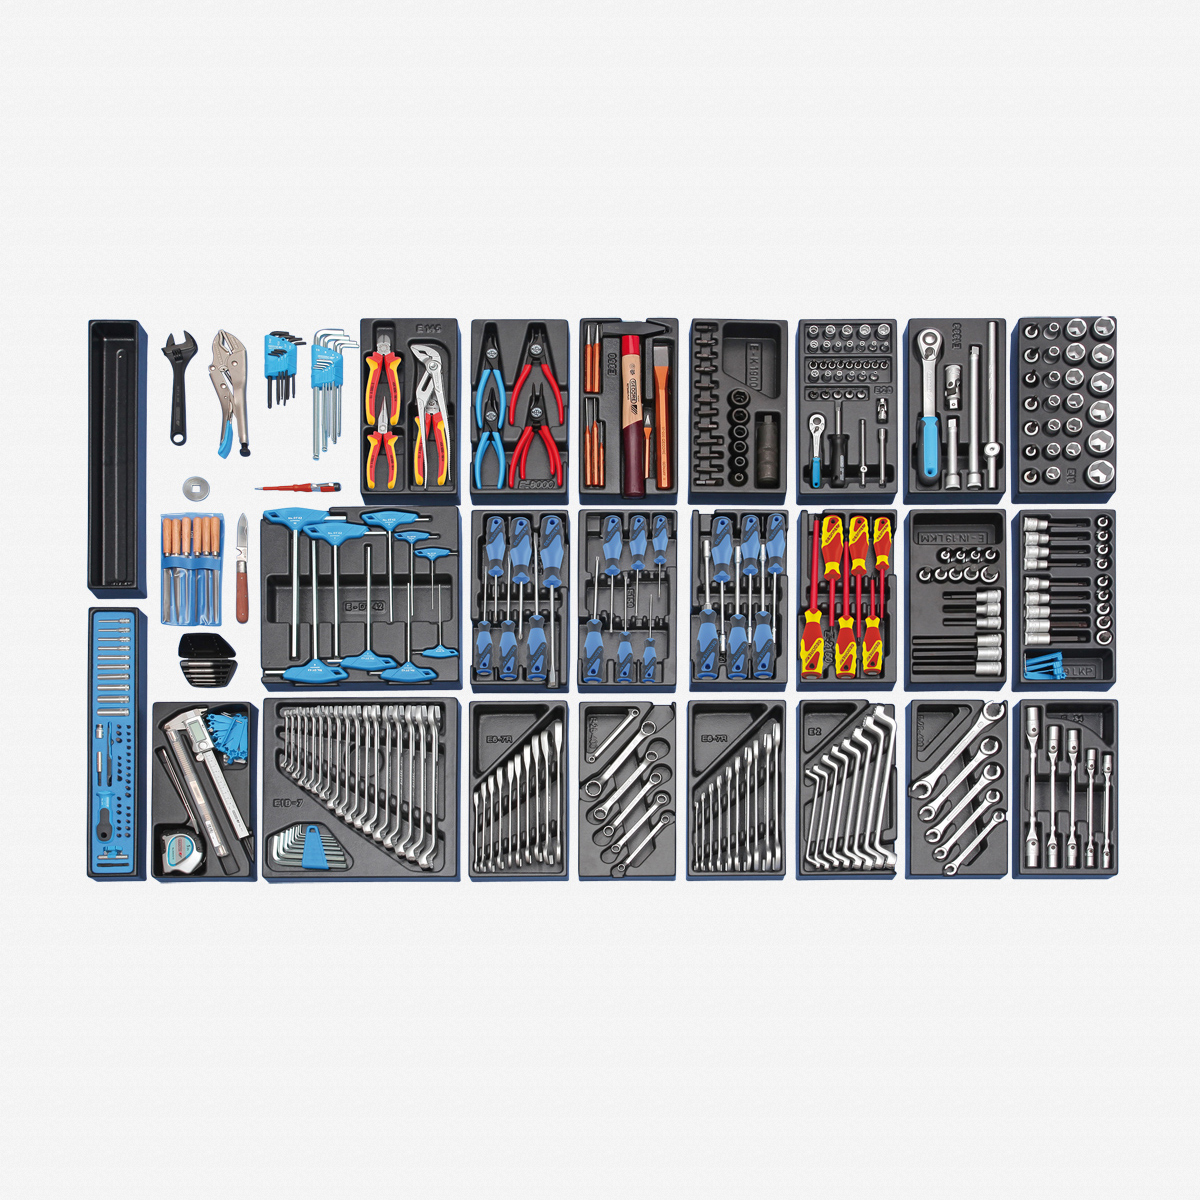 Gedore S 1500 ES-03 Module assortment large, 325 pcs - KC Tool